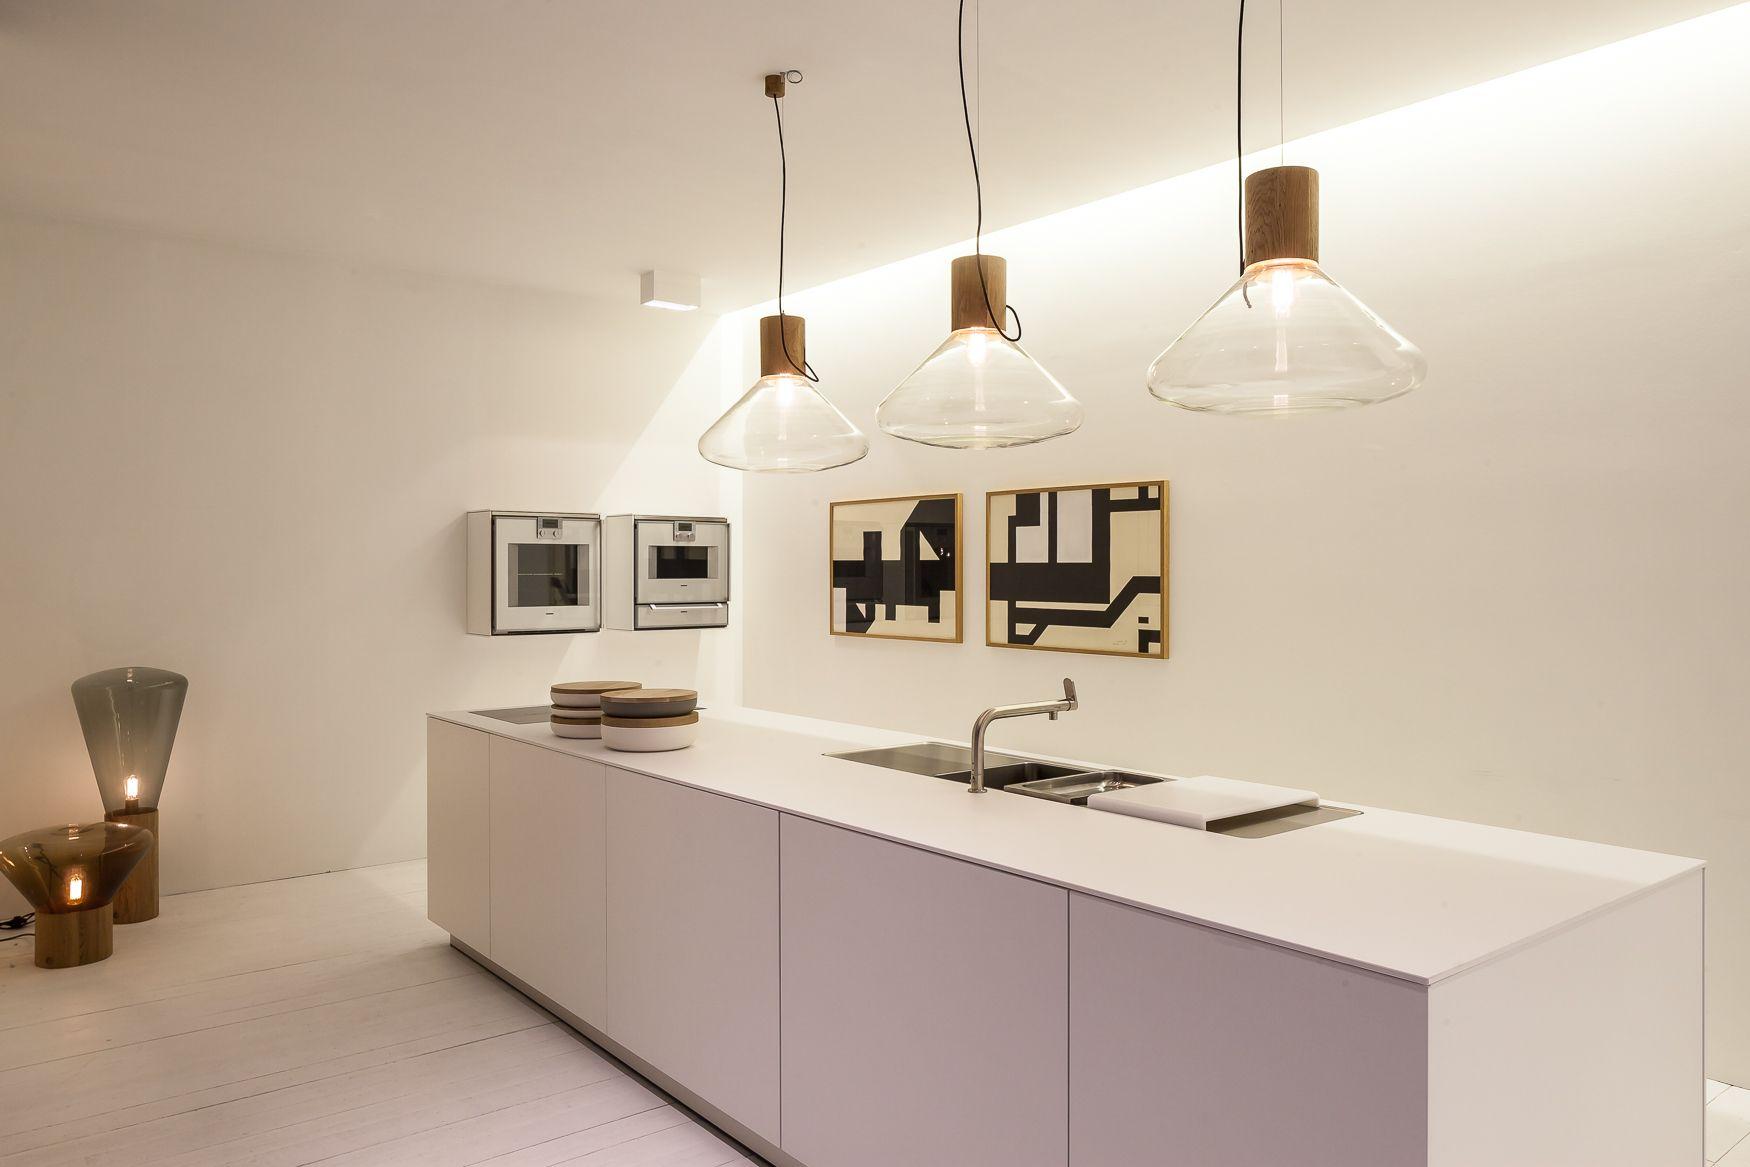 Bulthaup B3 Keuken Inrichting Design Lampen Brokis Verlichting Interieur Kortrijk 2012 Keuken Inrichting Interieur Verlichting